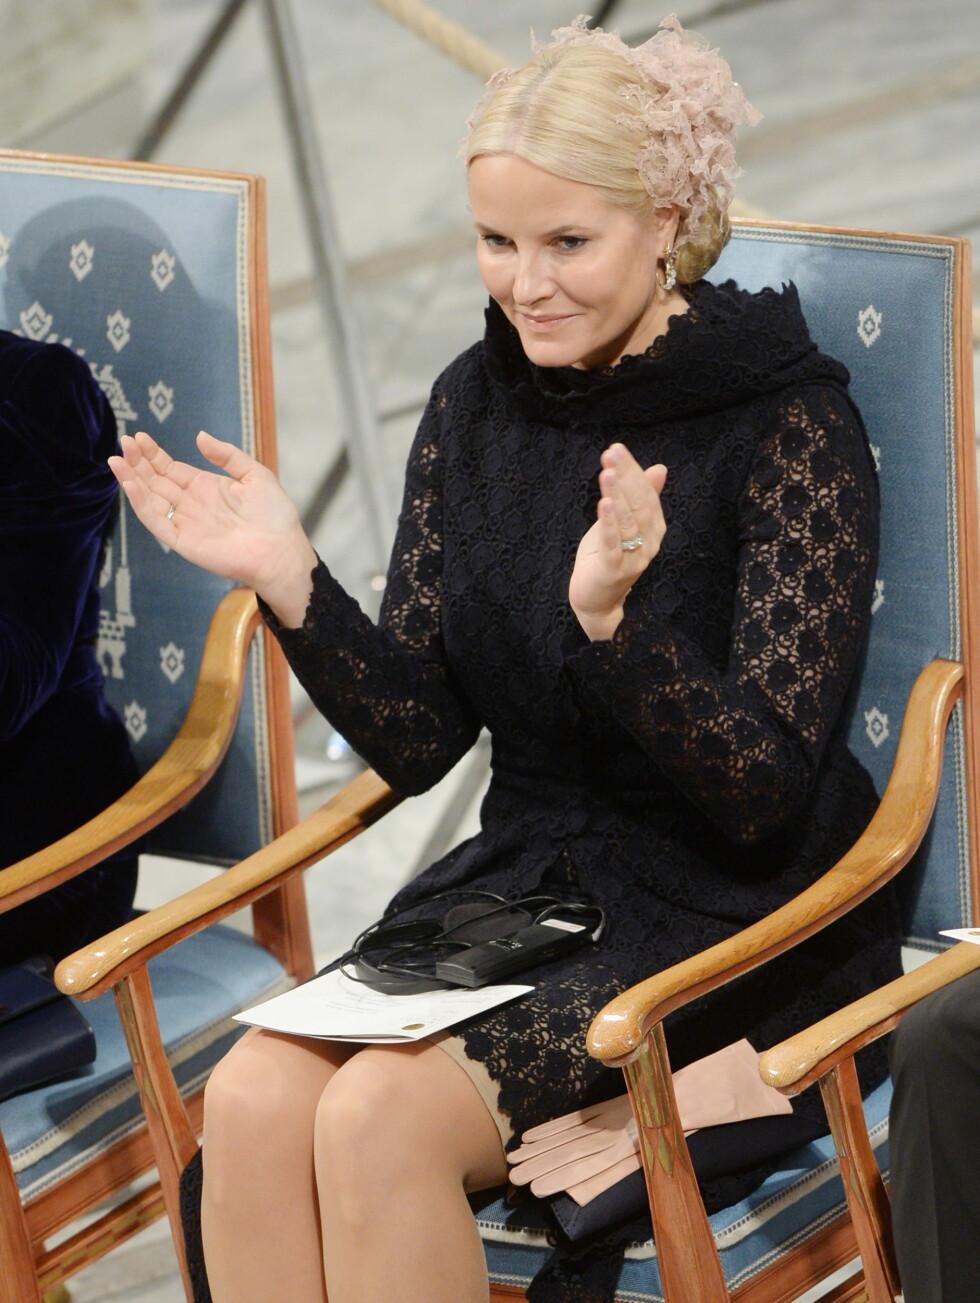 DEN LILLE SORTE: Mette-Marit under prisutdelingen i Rådhuset i Oslo.  Foto: NTB Scanpix